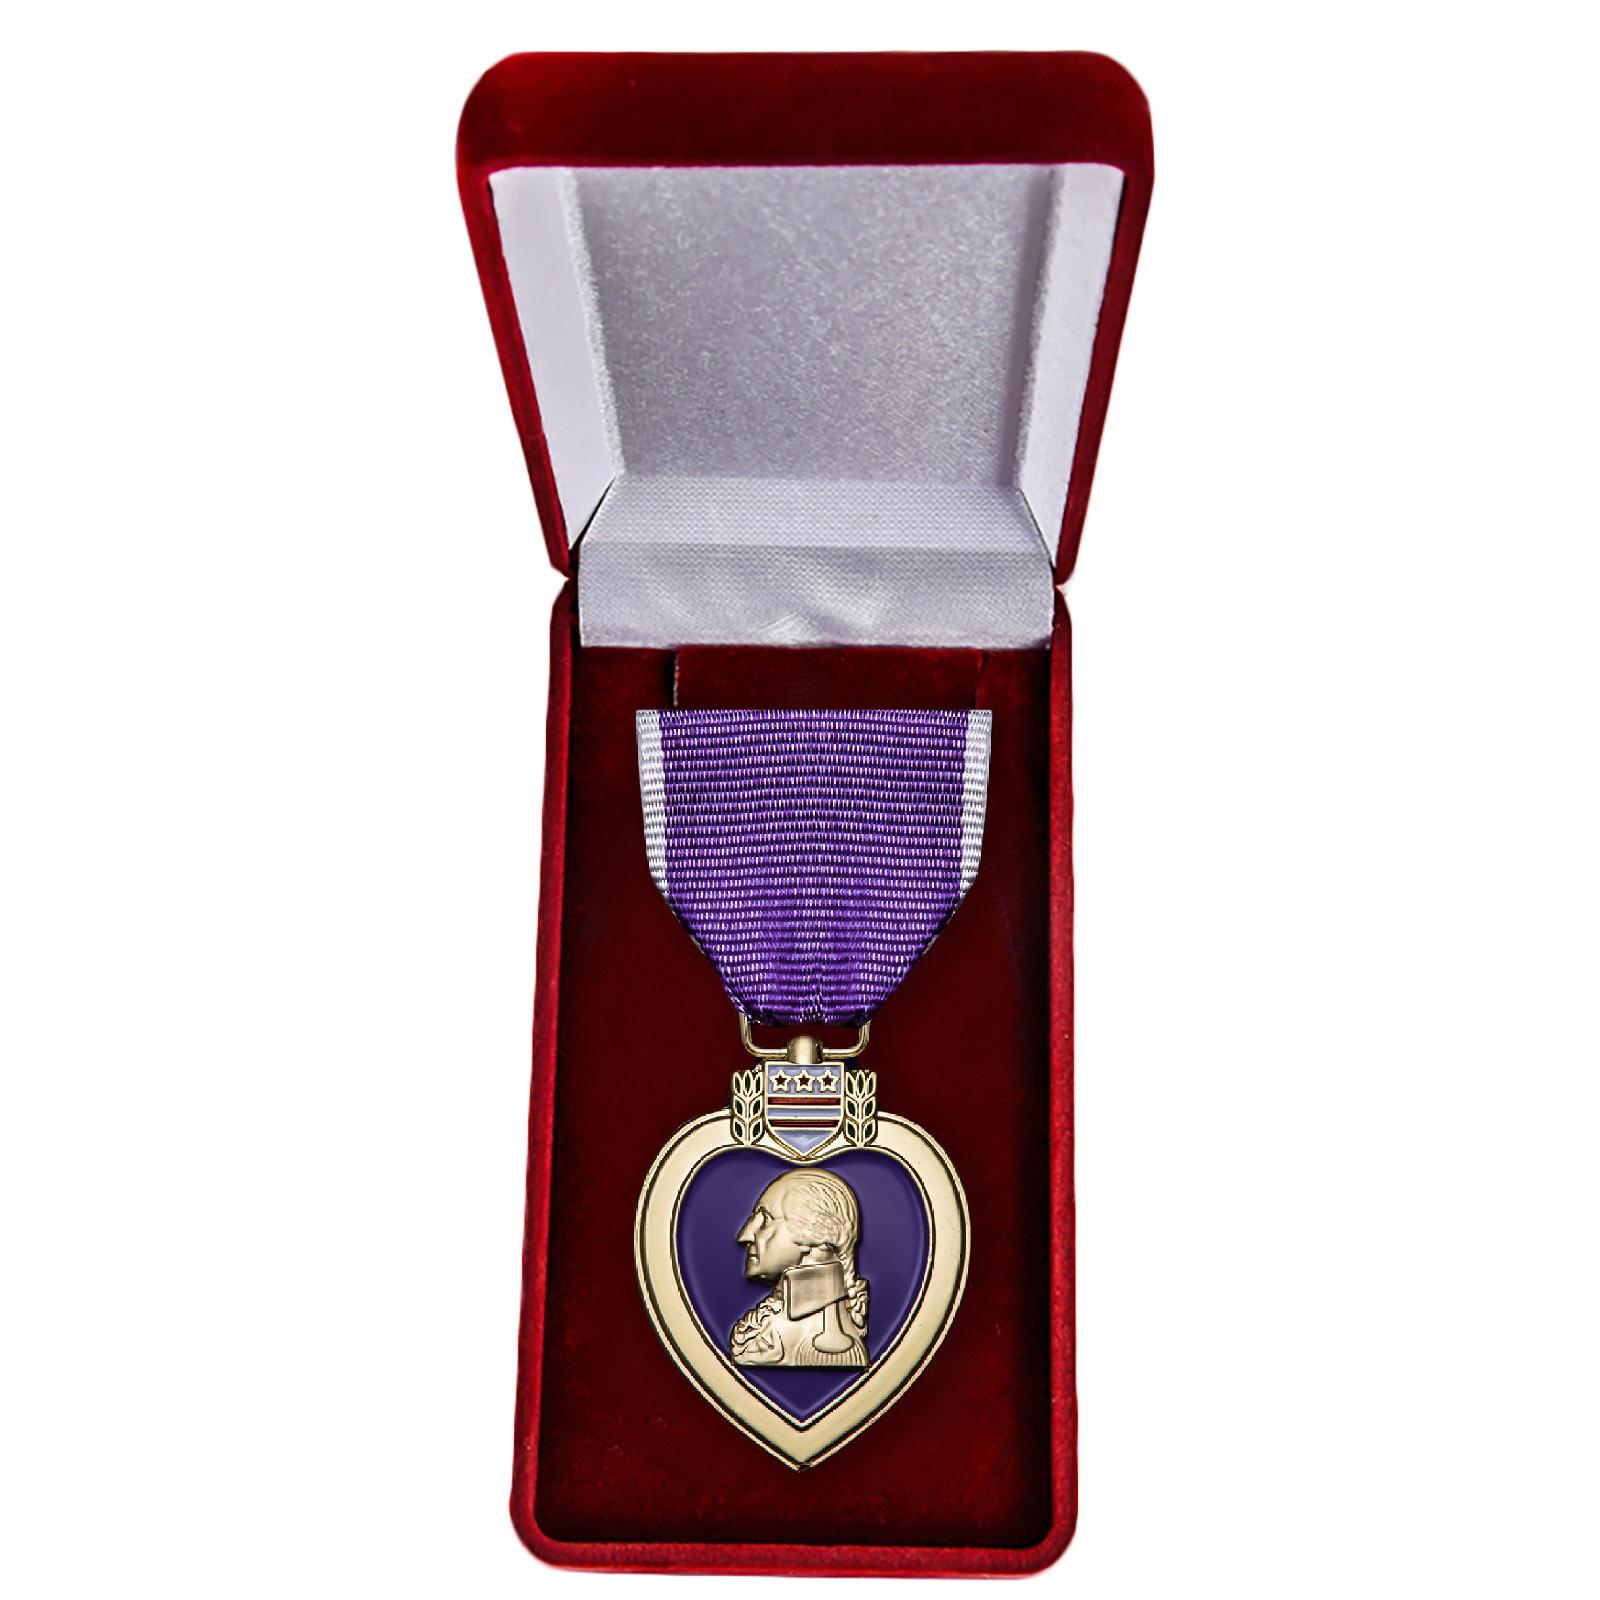 Памятная медаль Пурпурное сердце (США) - в футляре